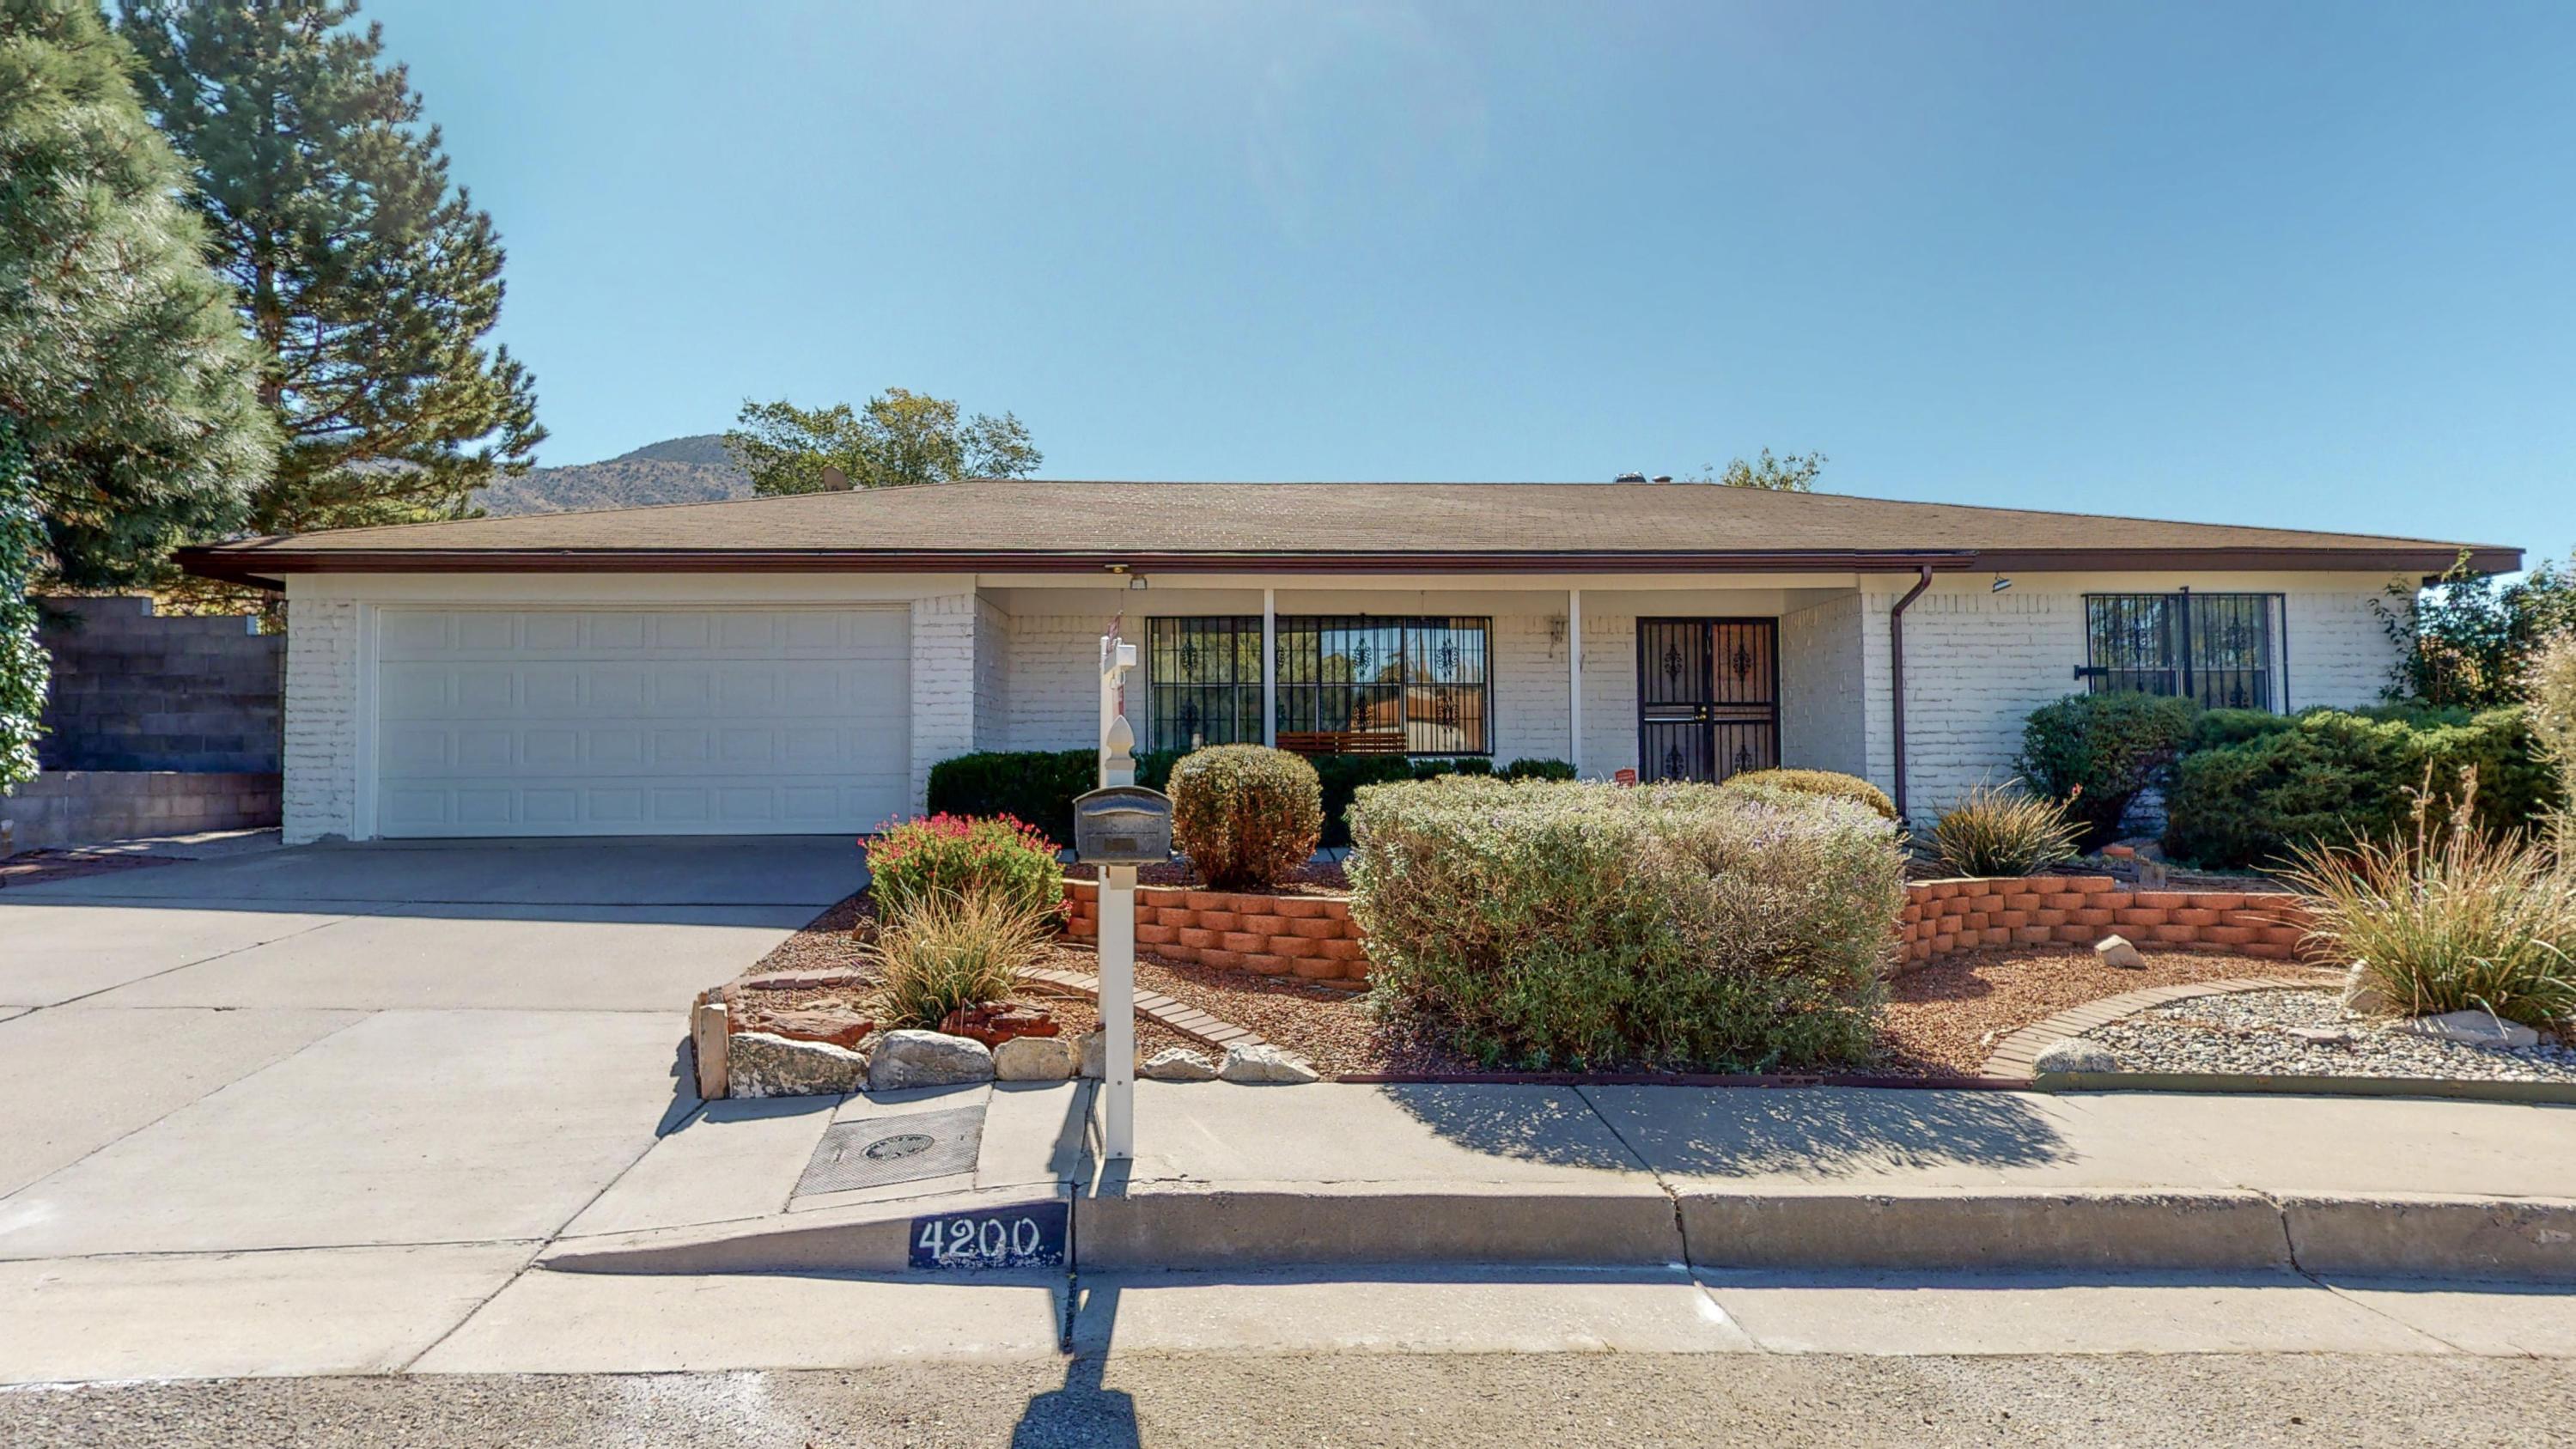 4200 LANDAU Street NE Property Photo - Albuquerque, NM real estate listing